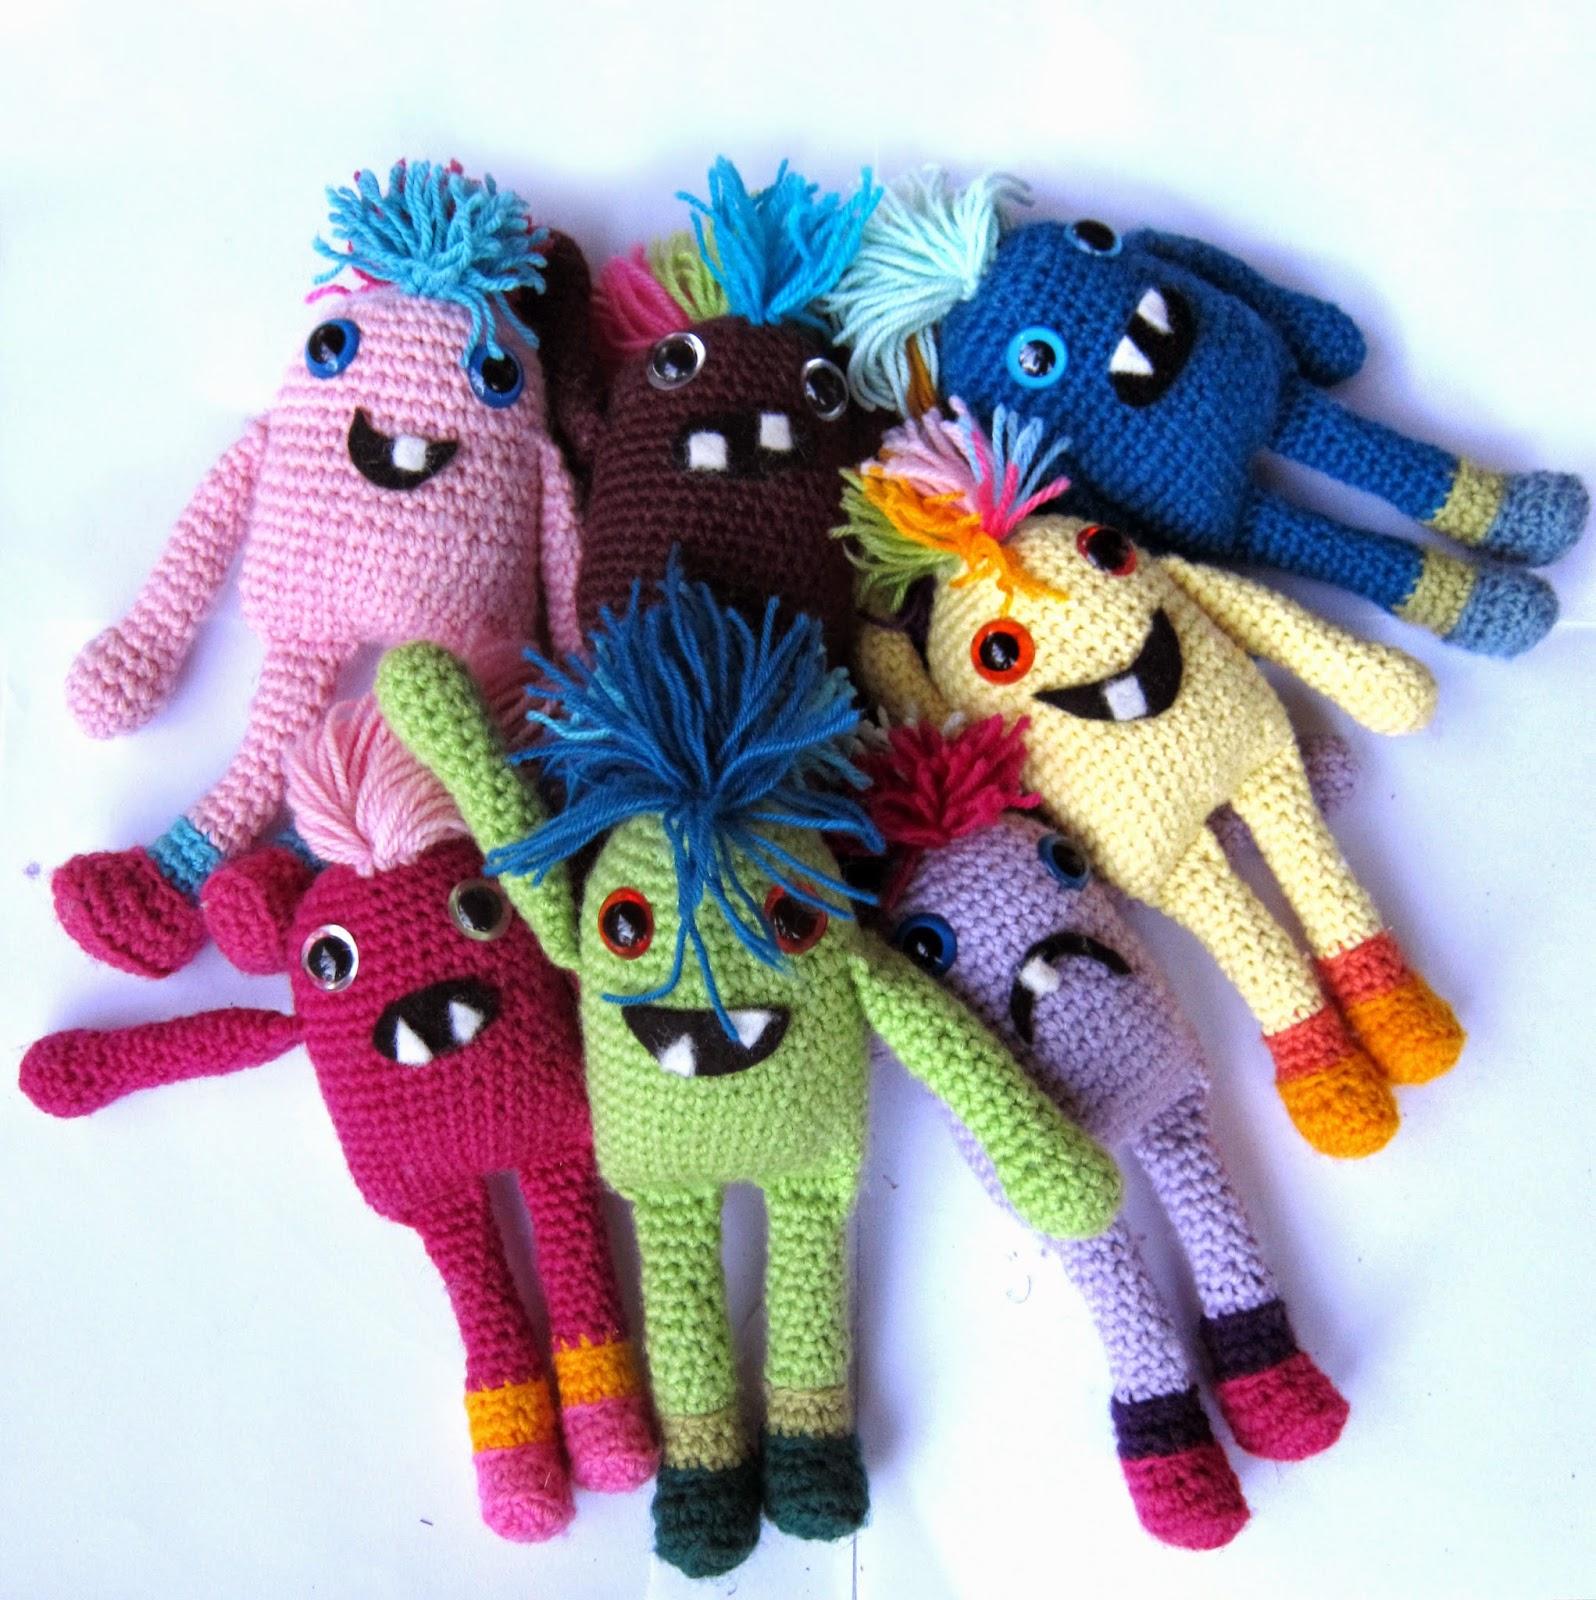 DMC Crochet Amigurumi Pattern - Mini Monsters - AMAZING CRAFT | 1600x1596